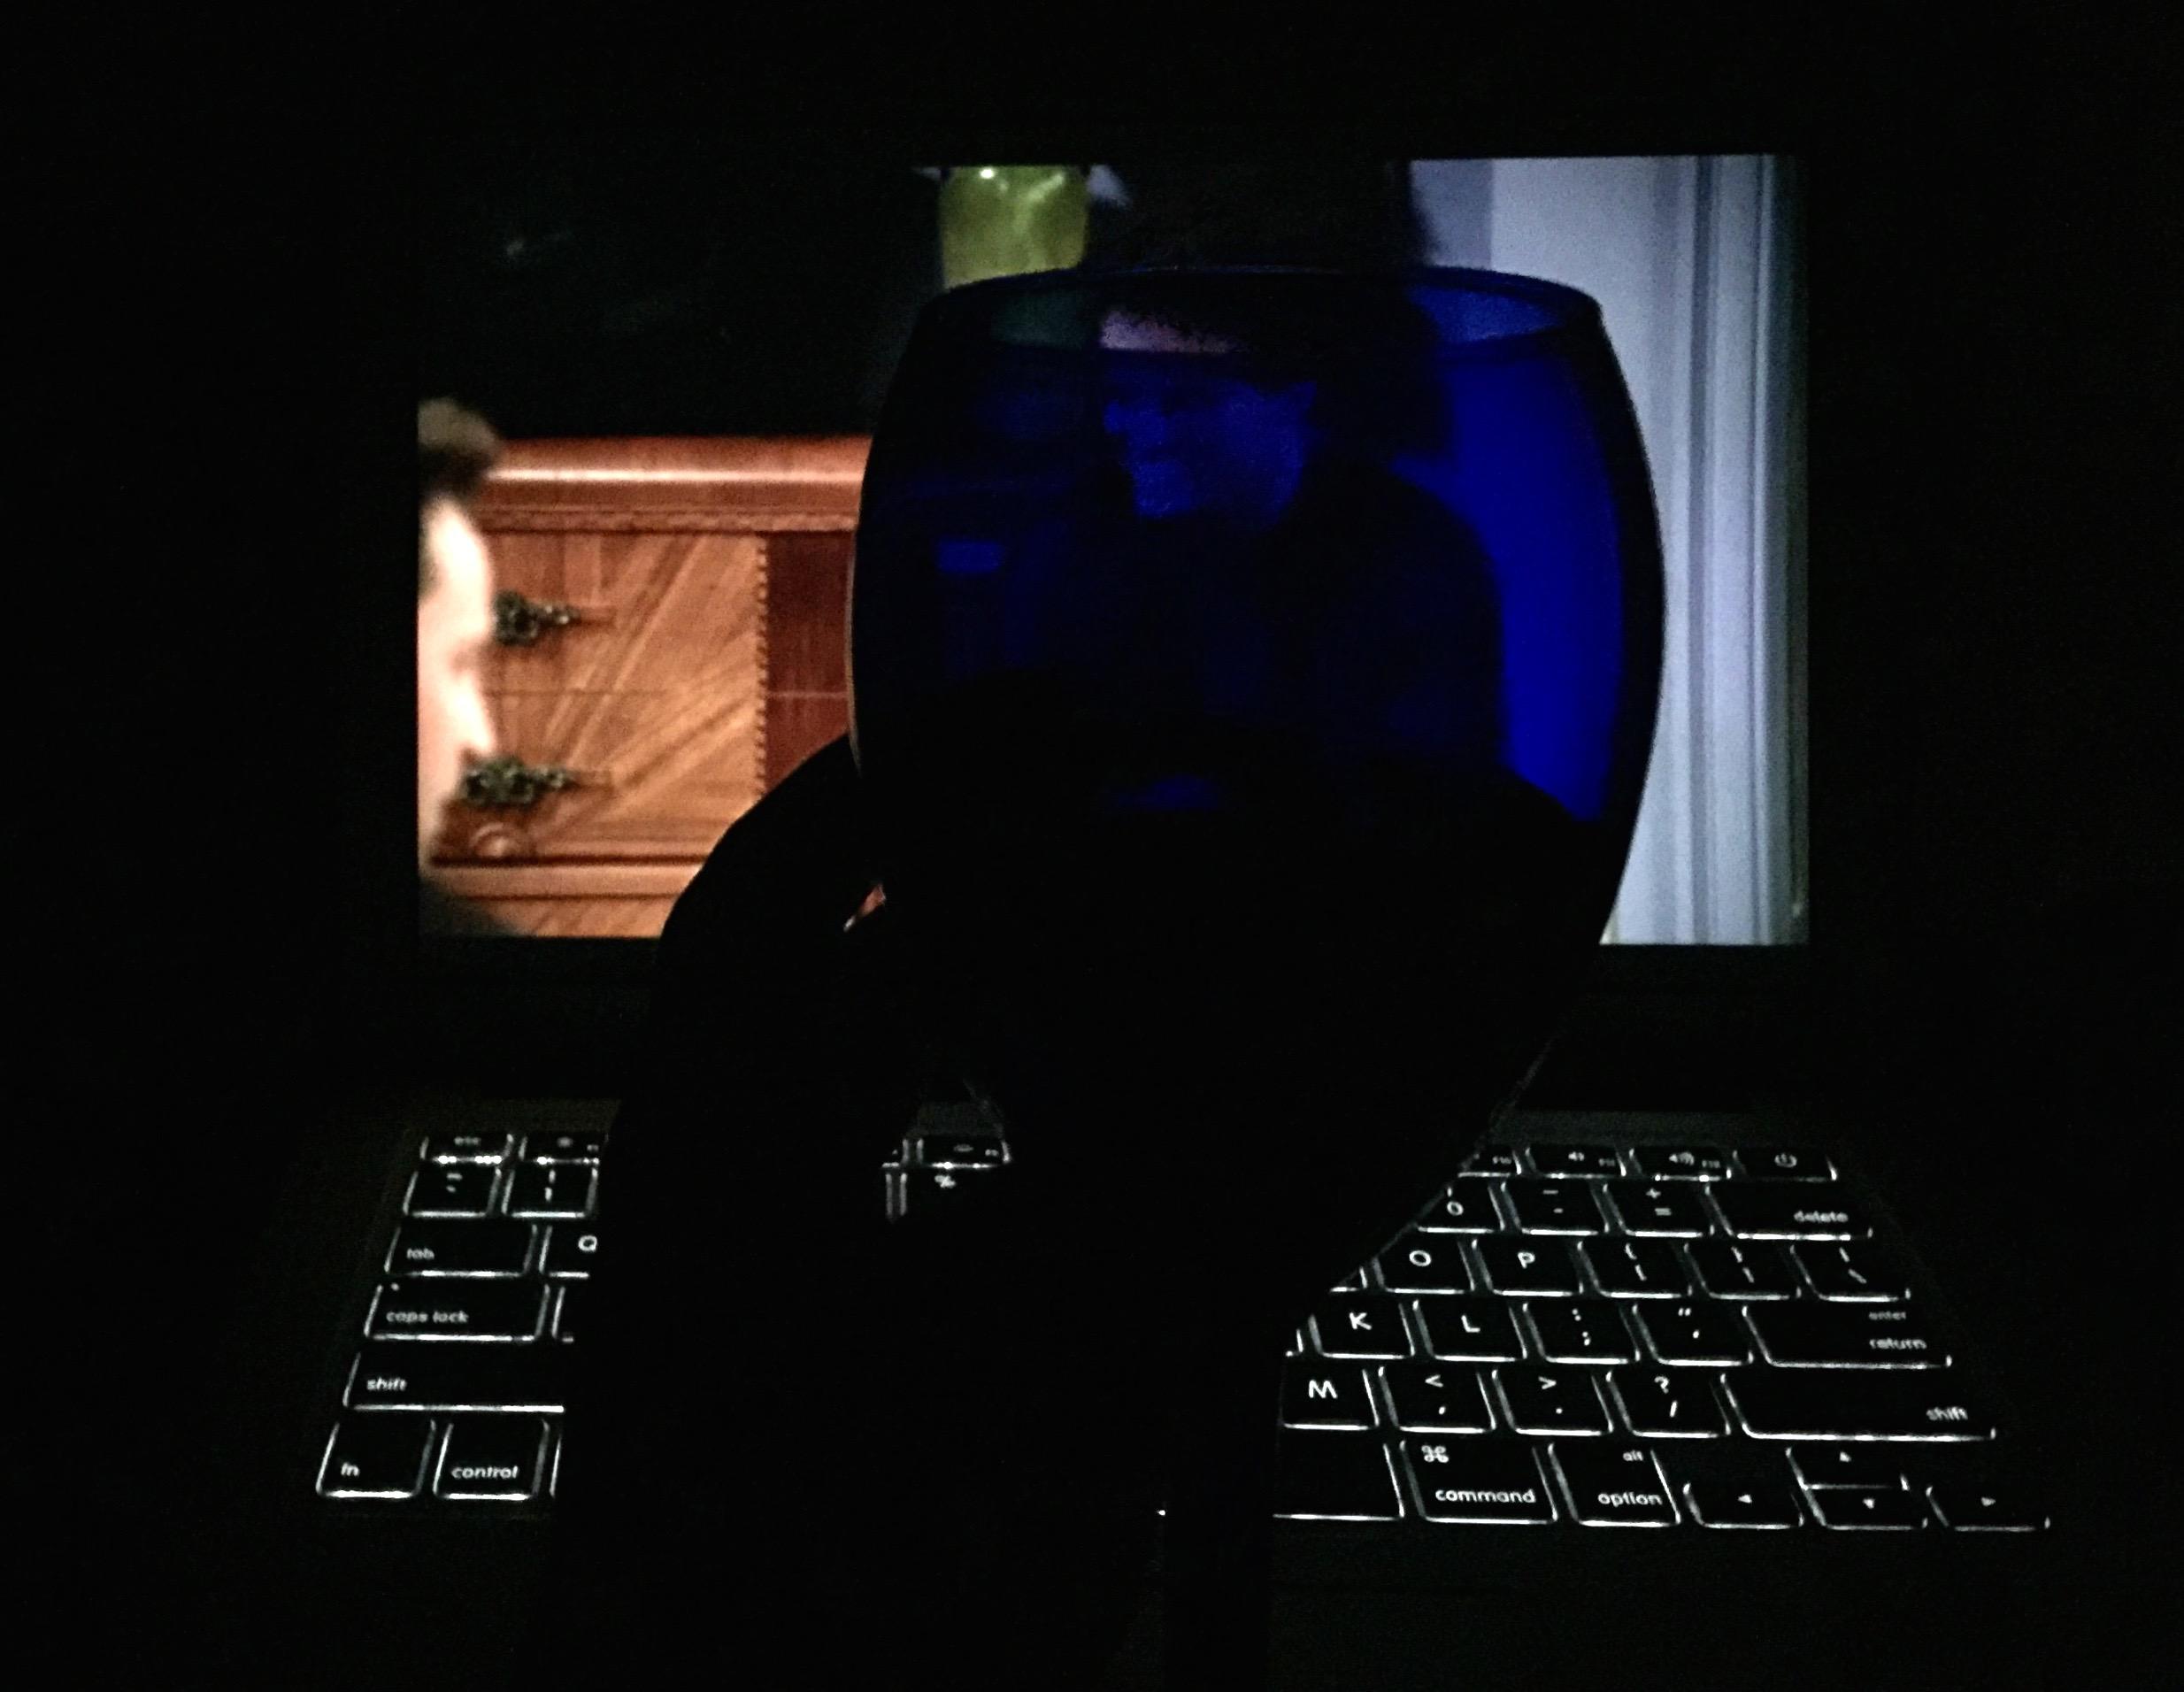 wine computer